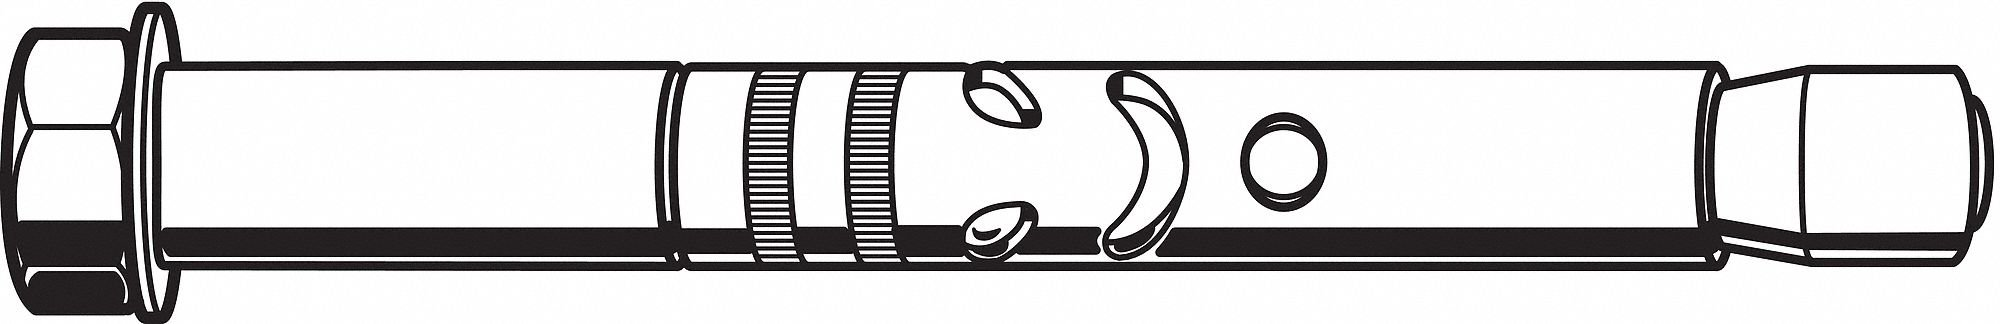 Hex Nut Sleeve Anchor, Steel, 1/4'' Dia., 2-1/2'' L, 10 Thread Size, Zinc Plated